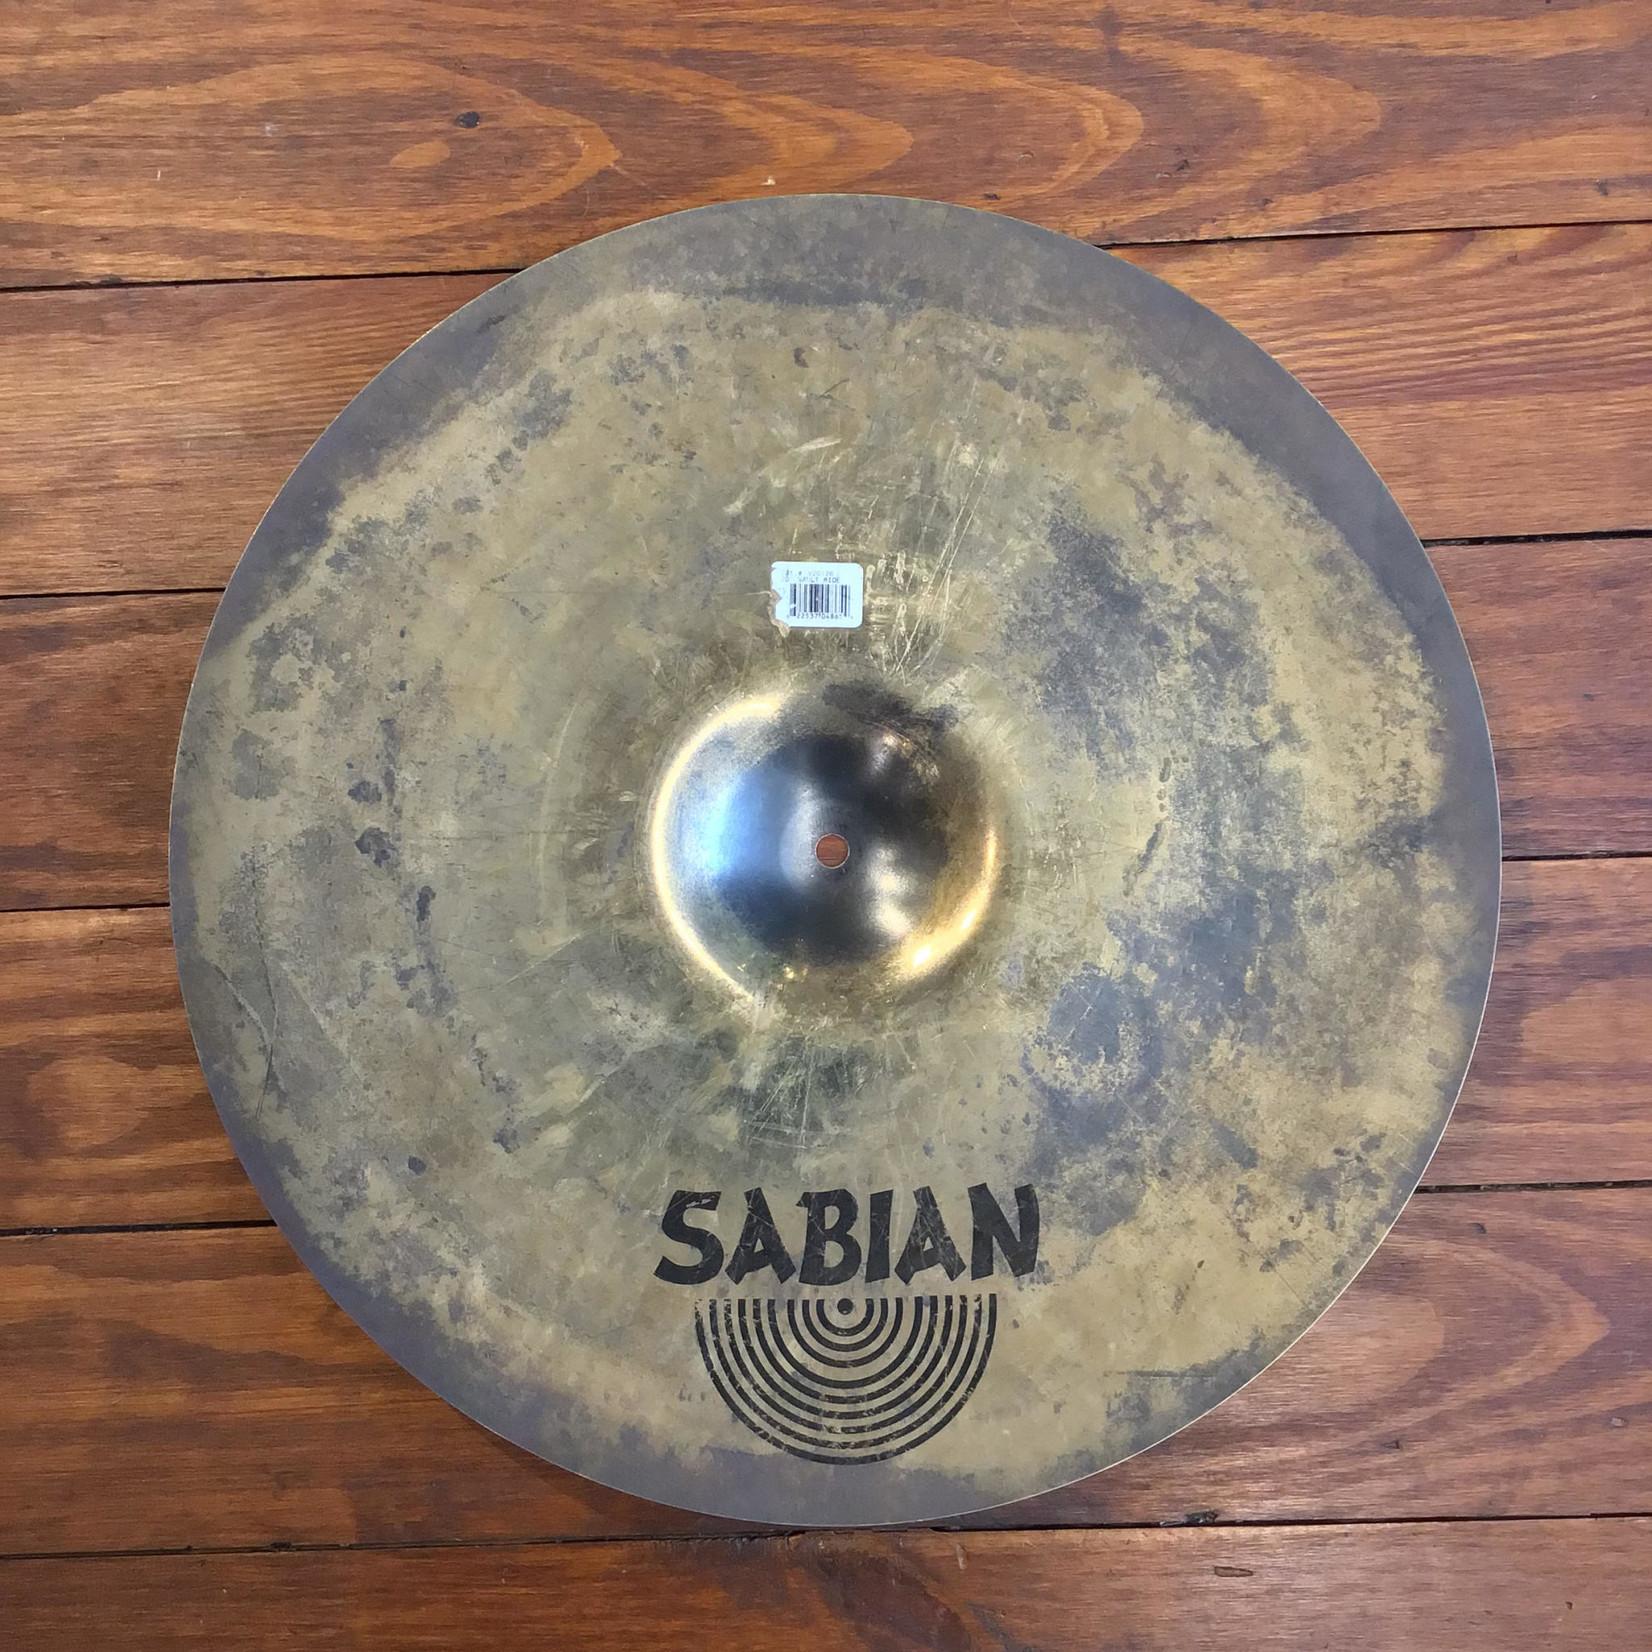 "Sabian USED Sabian Vault 20"" Ride Cymbal"